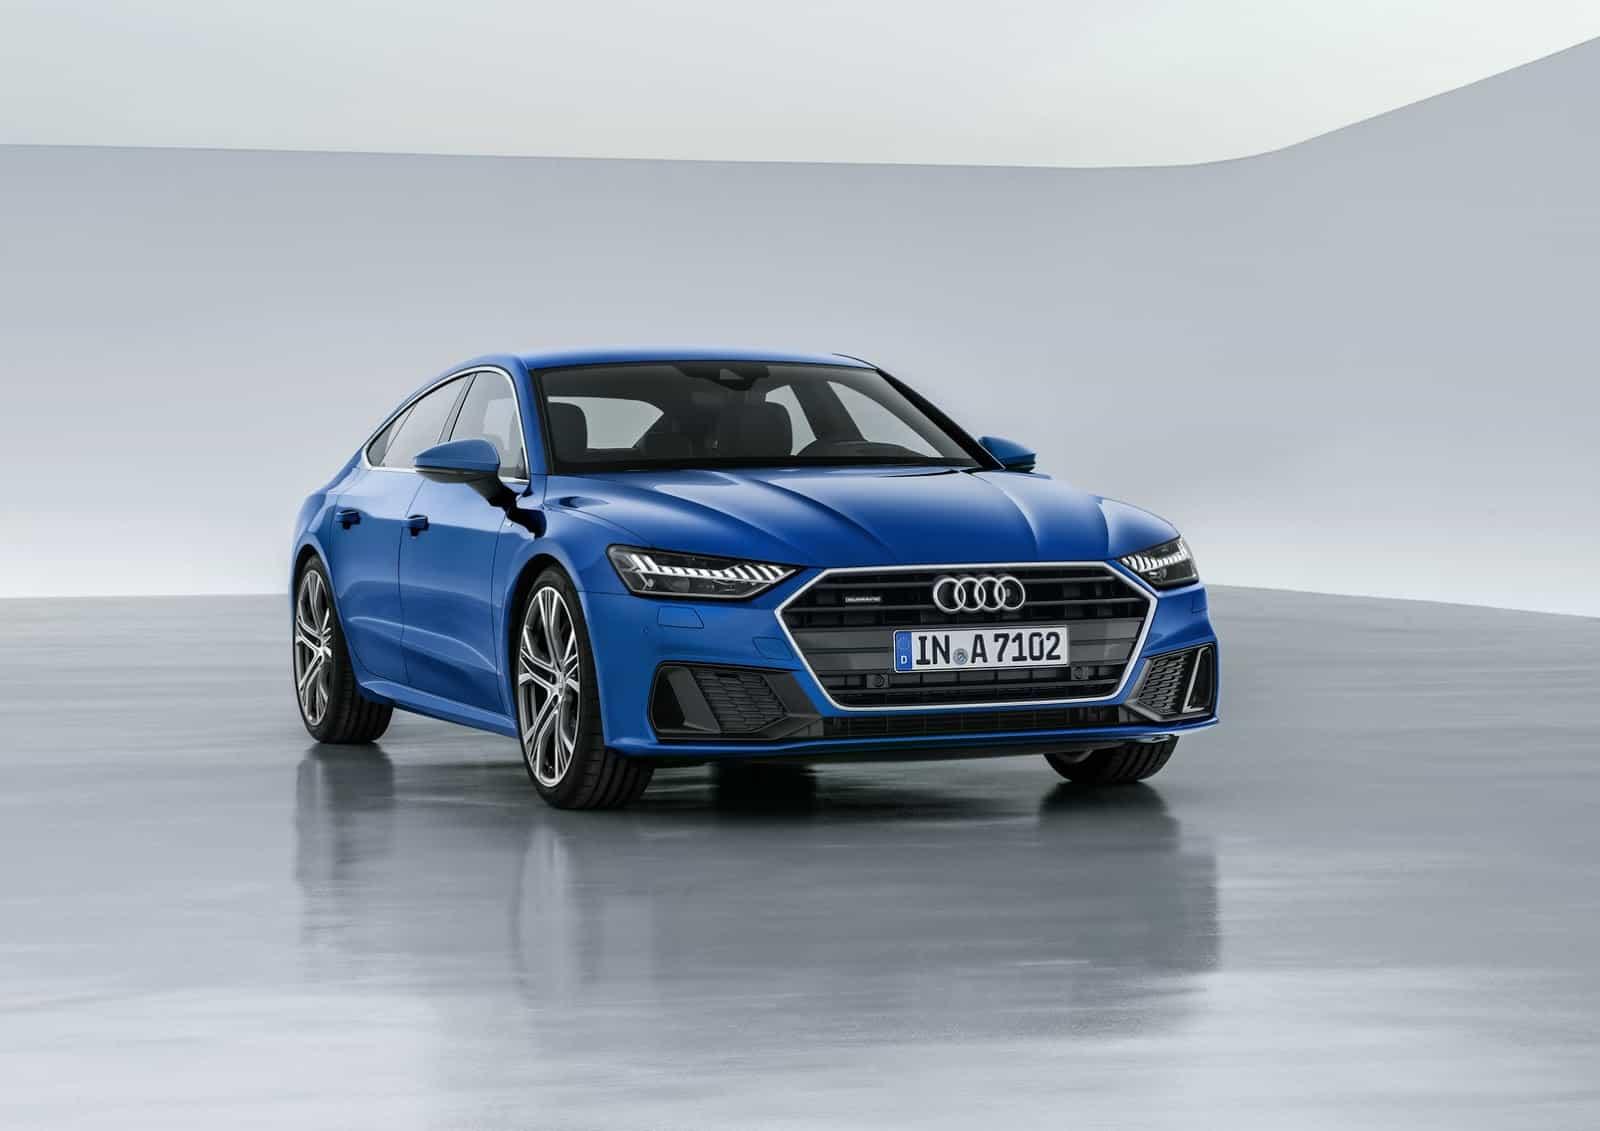 2018-Audi-A7-Sportback-19CSP